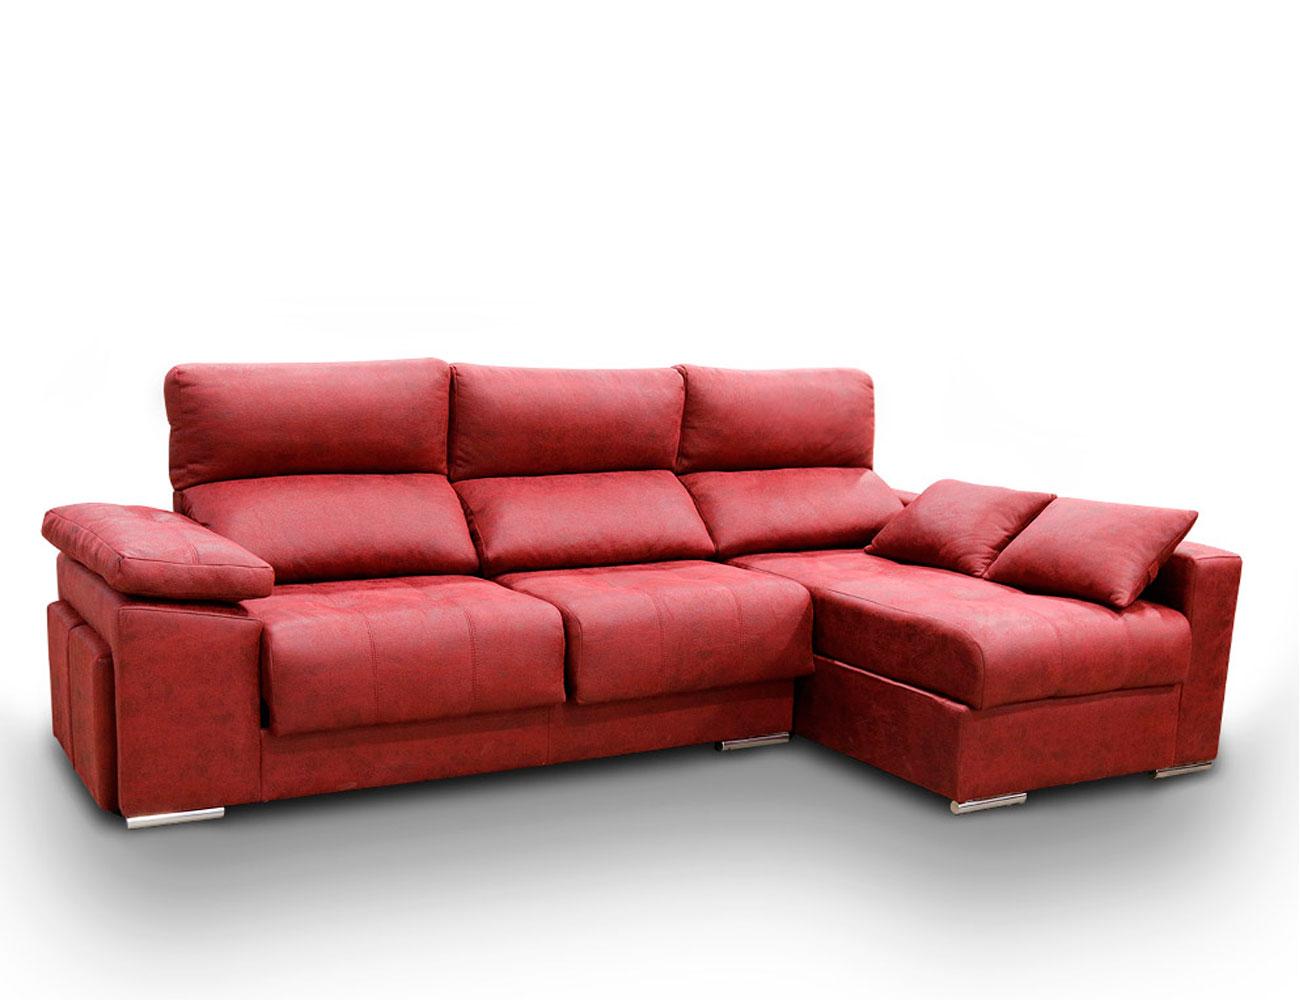 Sofa chaiselongue anti manchas rojo granate12